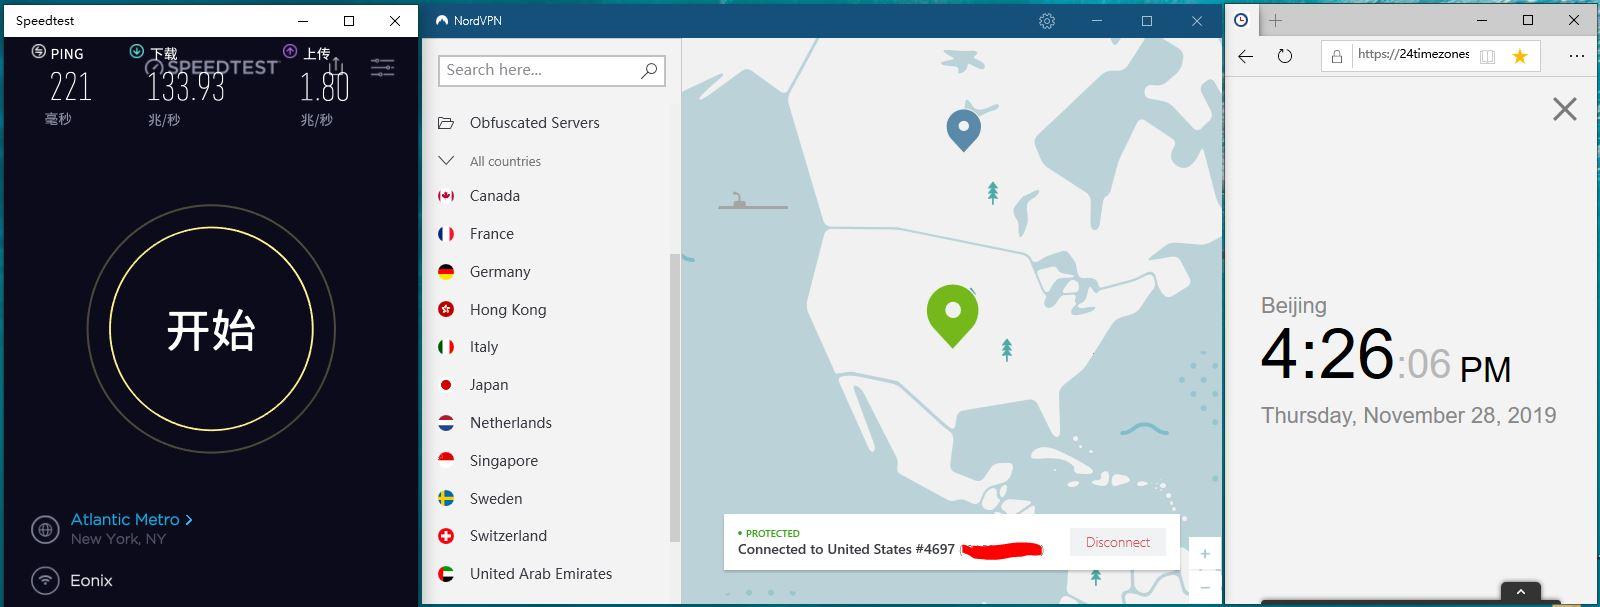 Windows NordVPN USA 4697 中国VPN翻墙 科学上网 SpeedTest测试-20191128